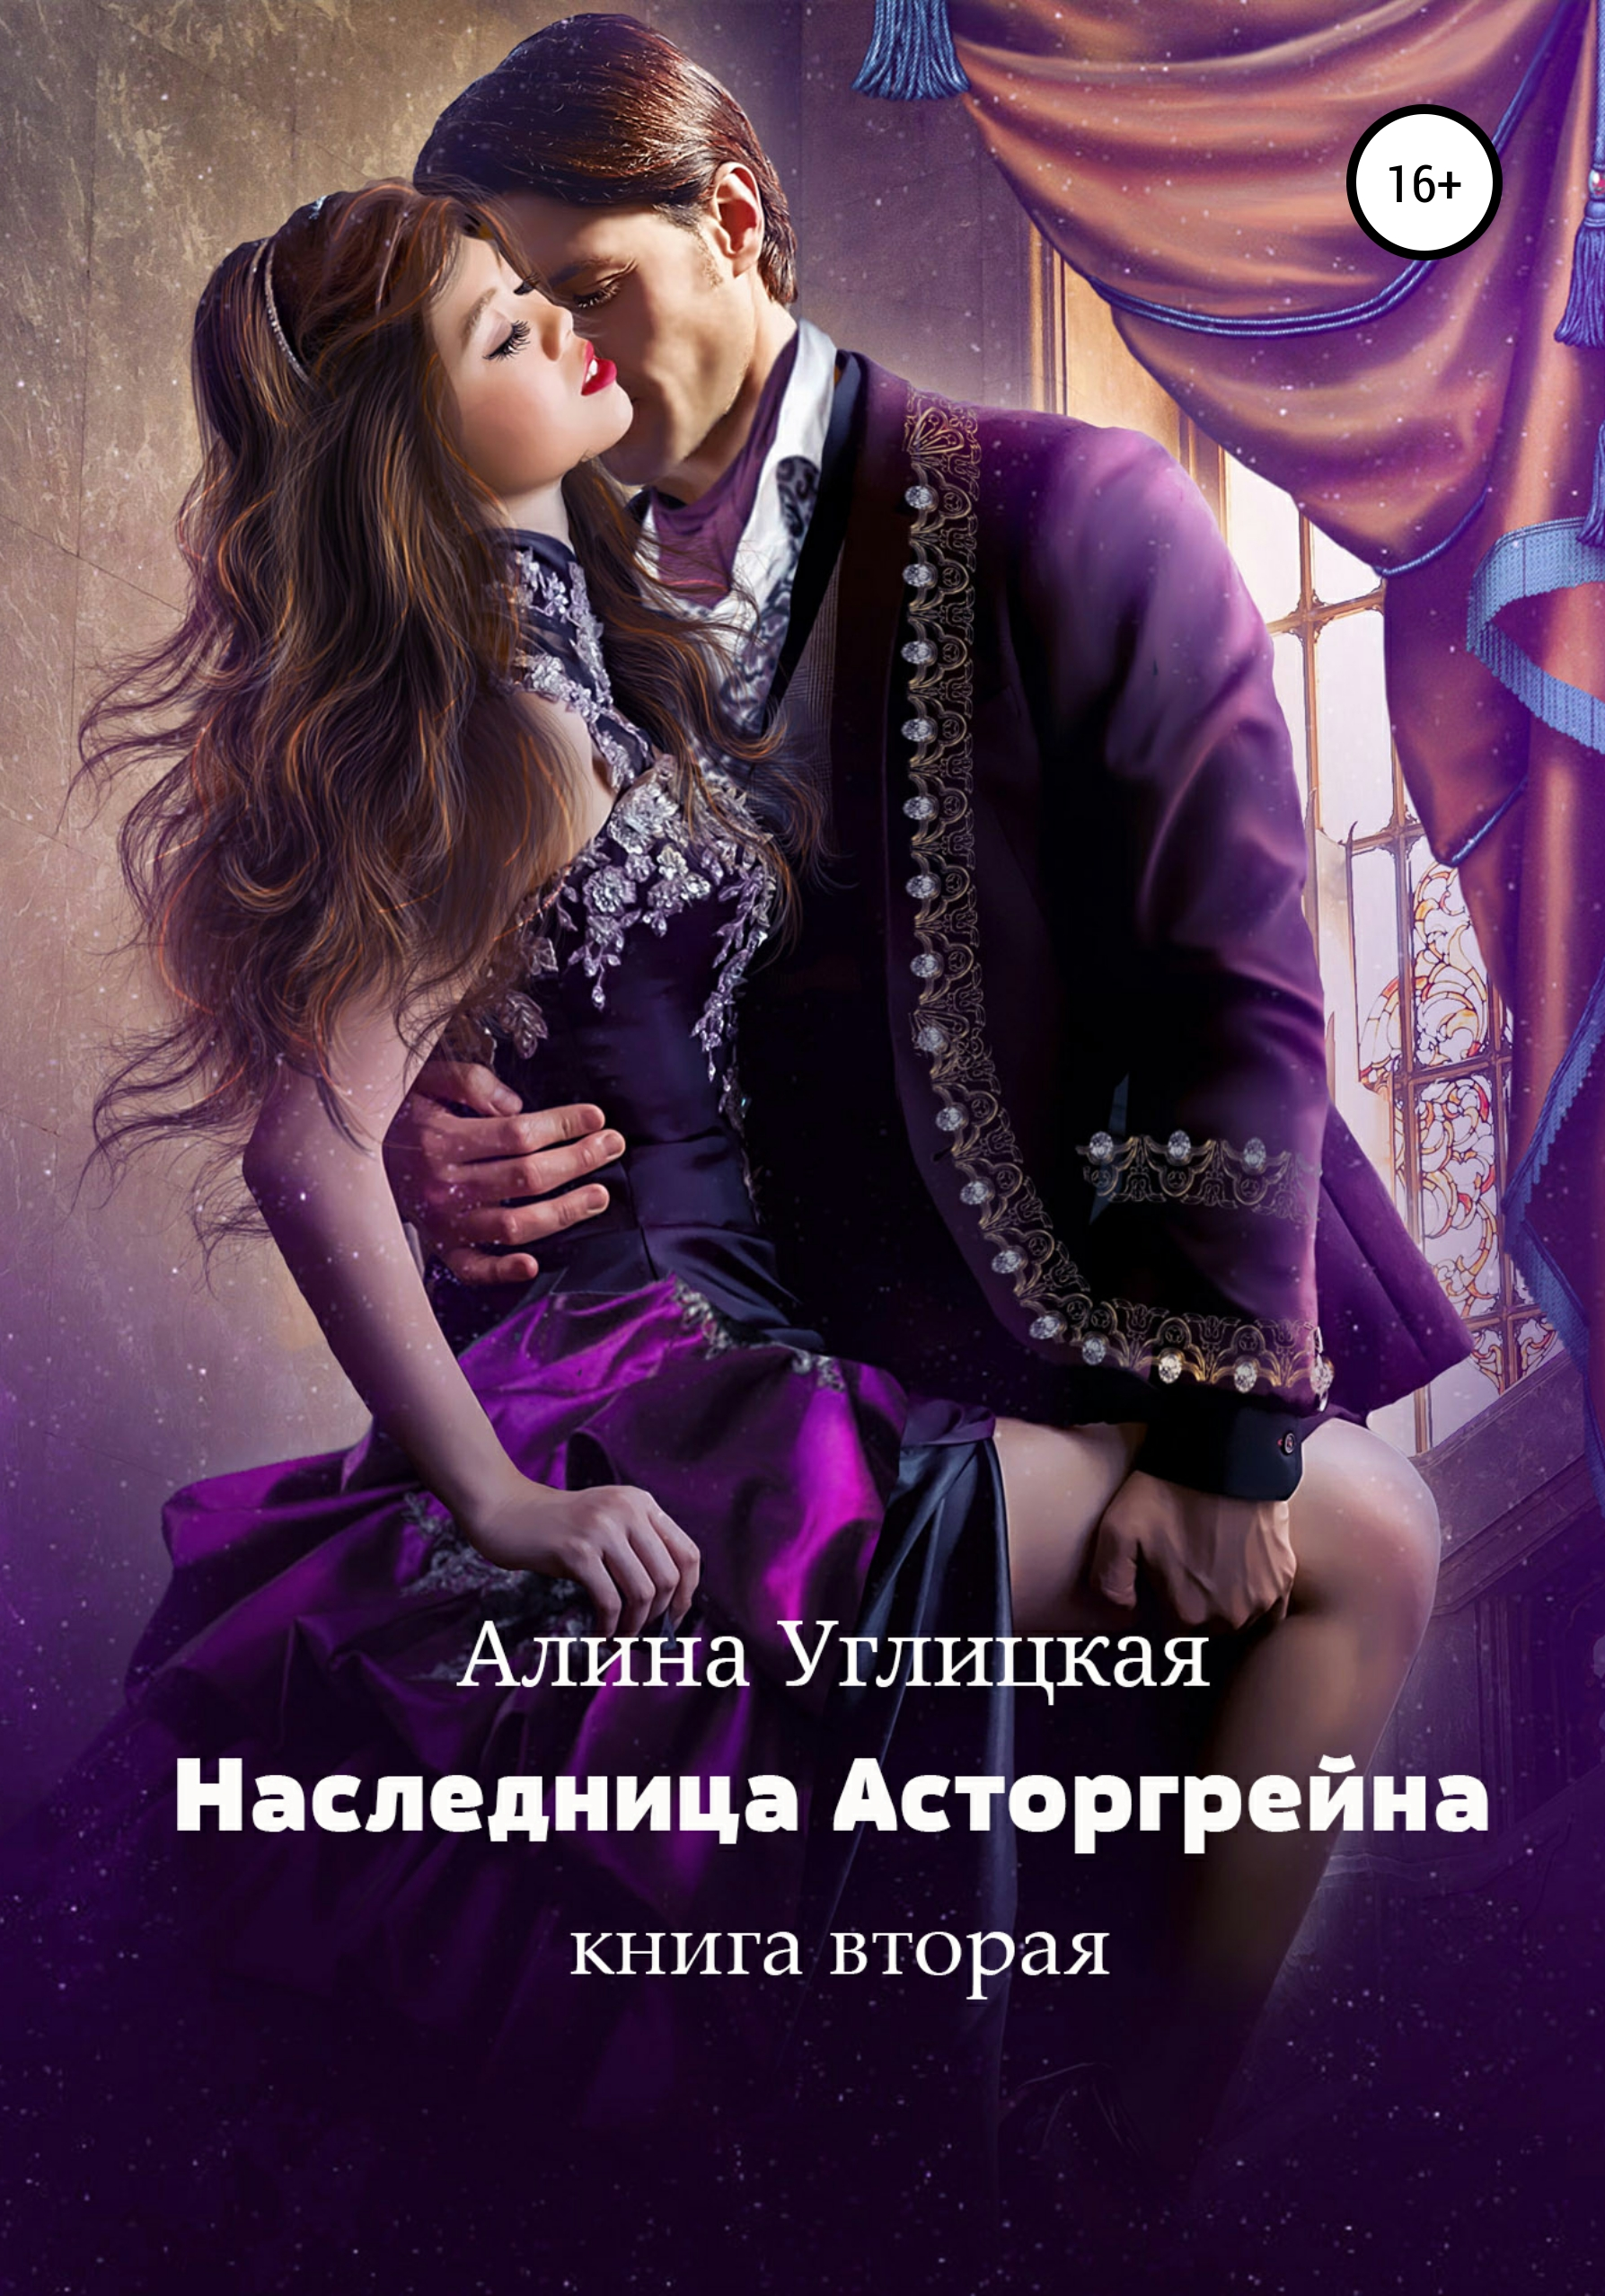 Алина Углицкая - Наследница Асторгрейна. Книга 2